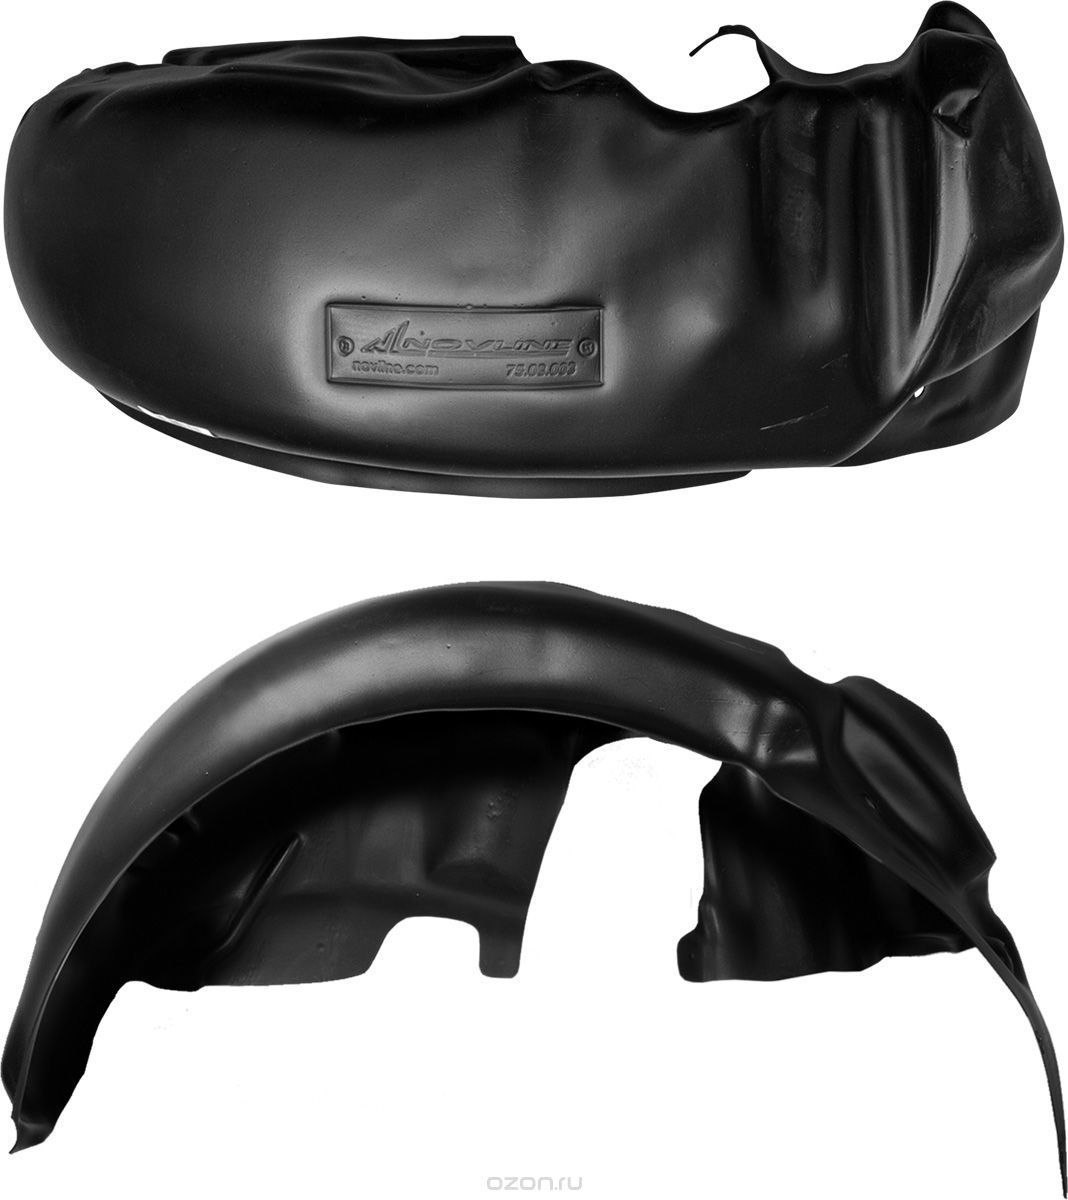 Подкрылок Novline-Autofamily, для Chevrolet Aveo, T250, 2004->, седан, передний левый подкрылок novline autofamily chevrolet cobalt 2013 седан